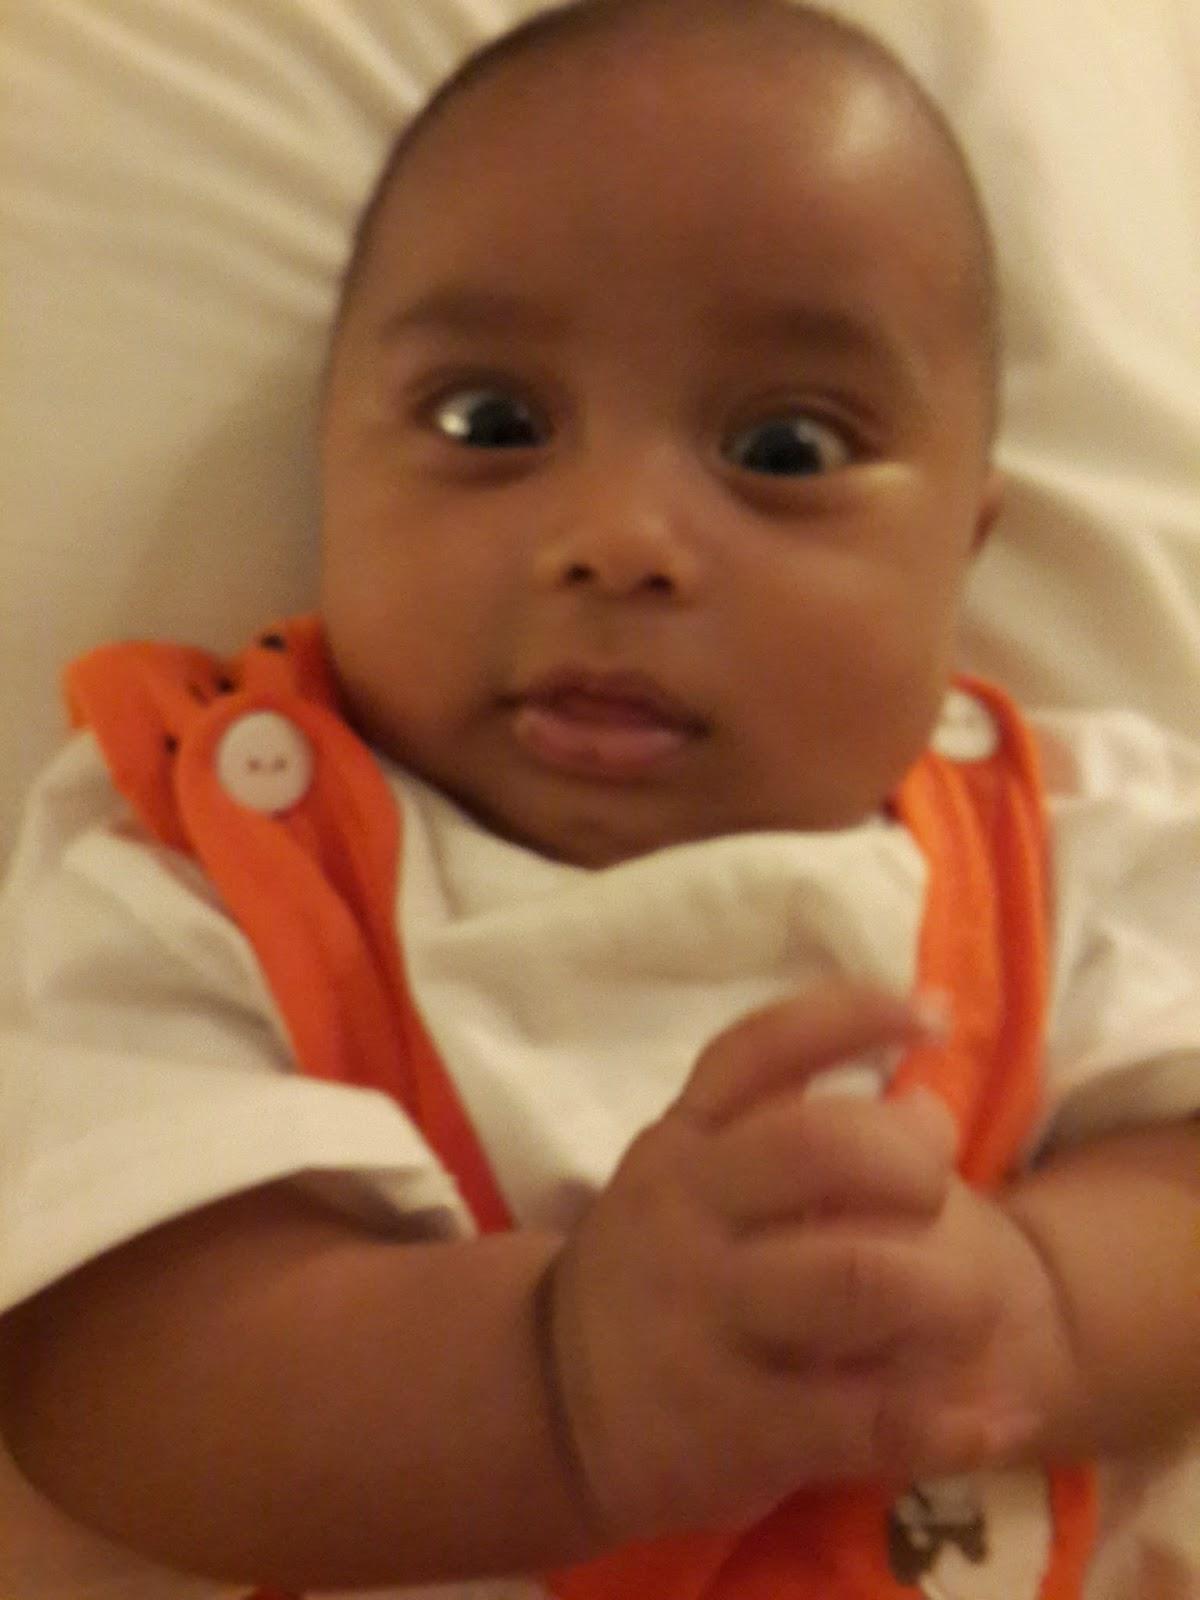 baby shaklee, Ali Asyraf